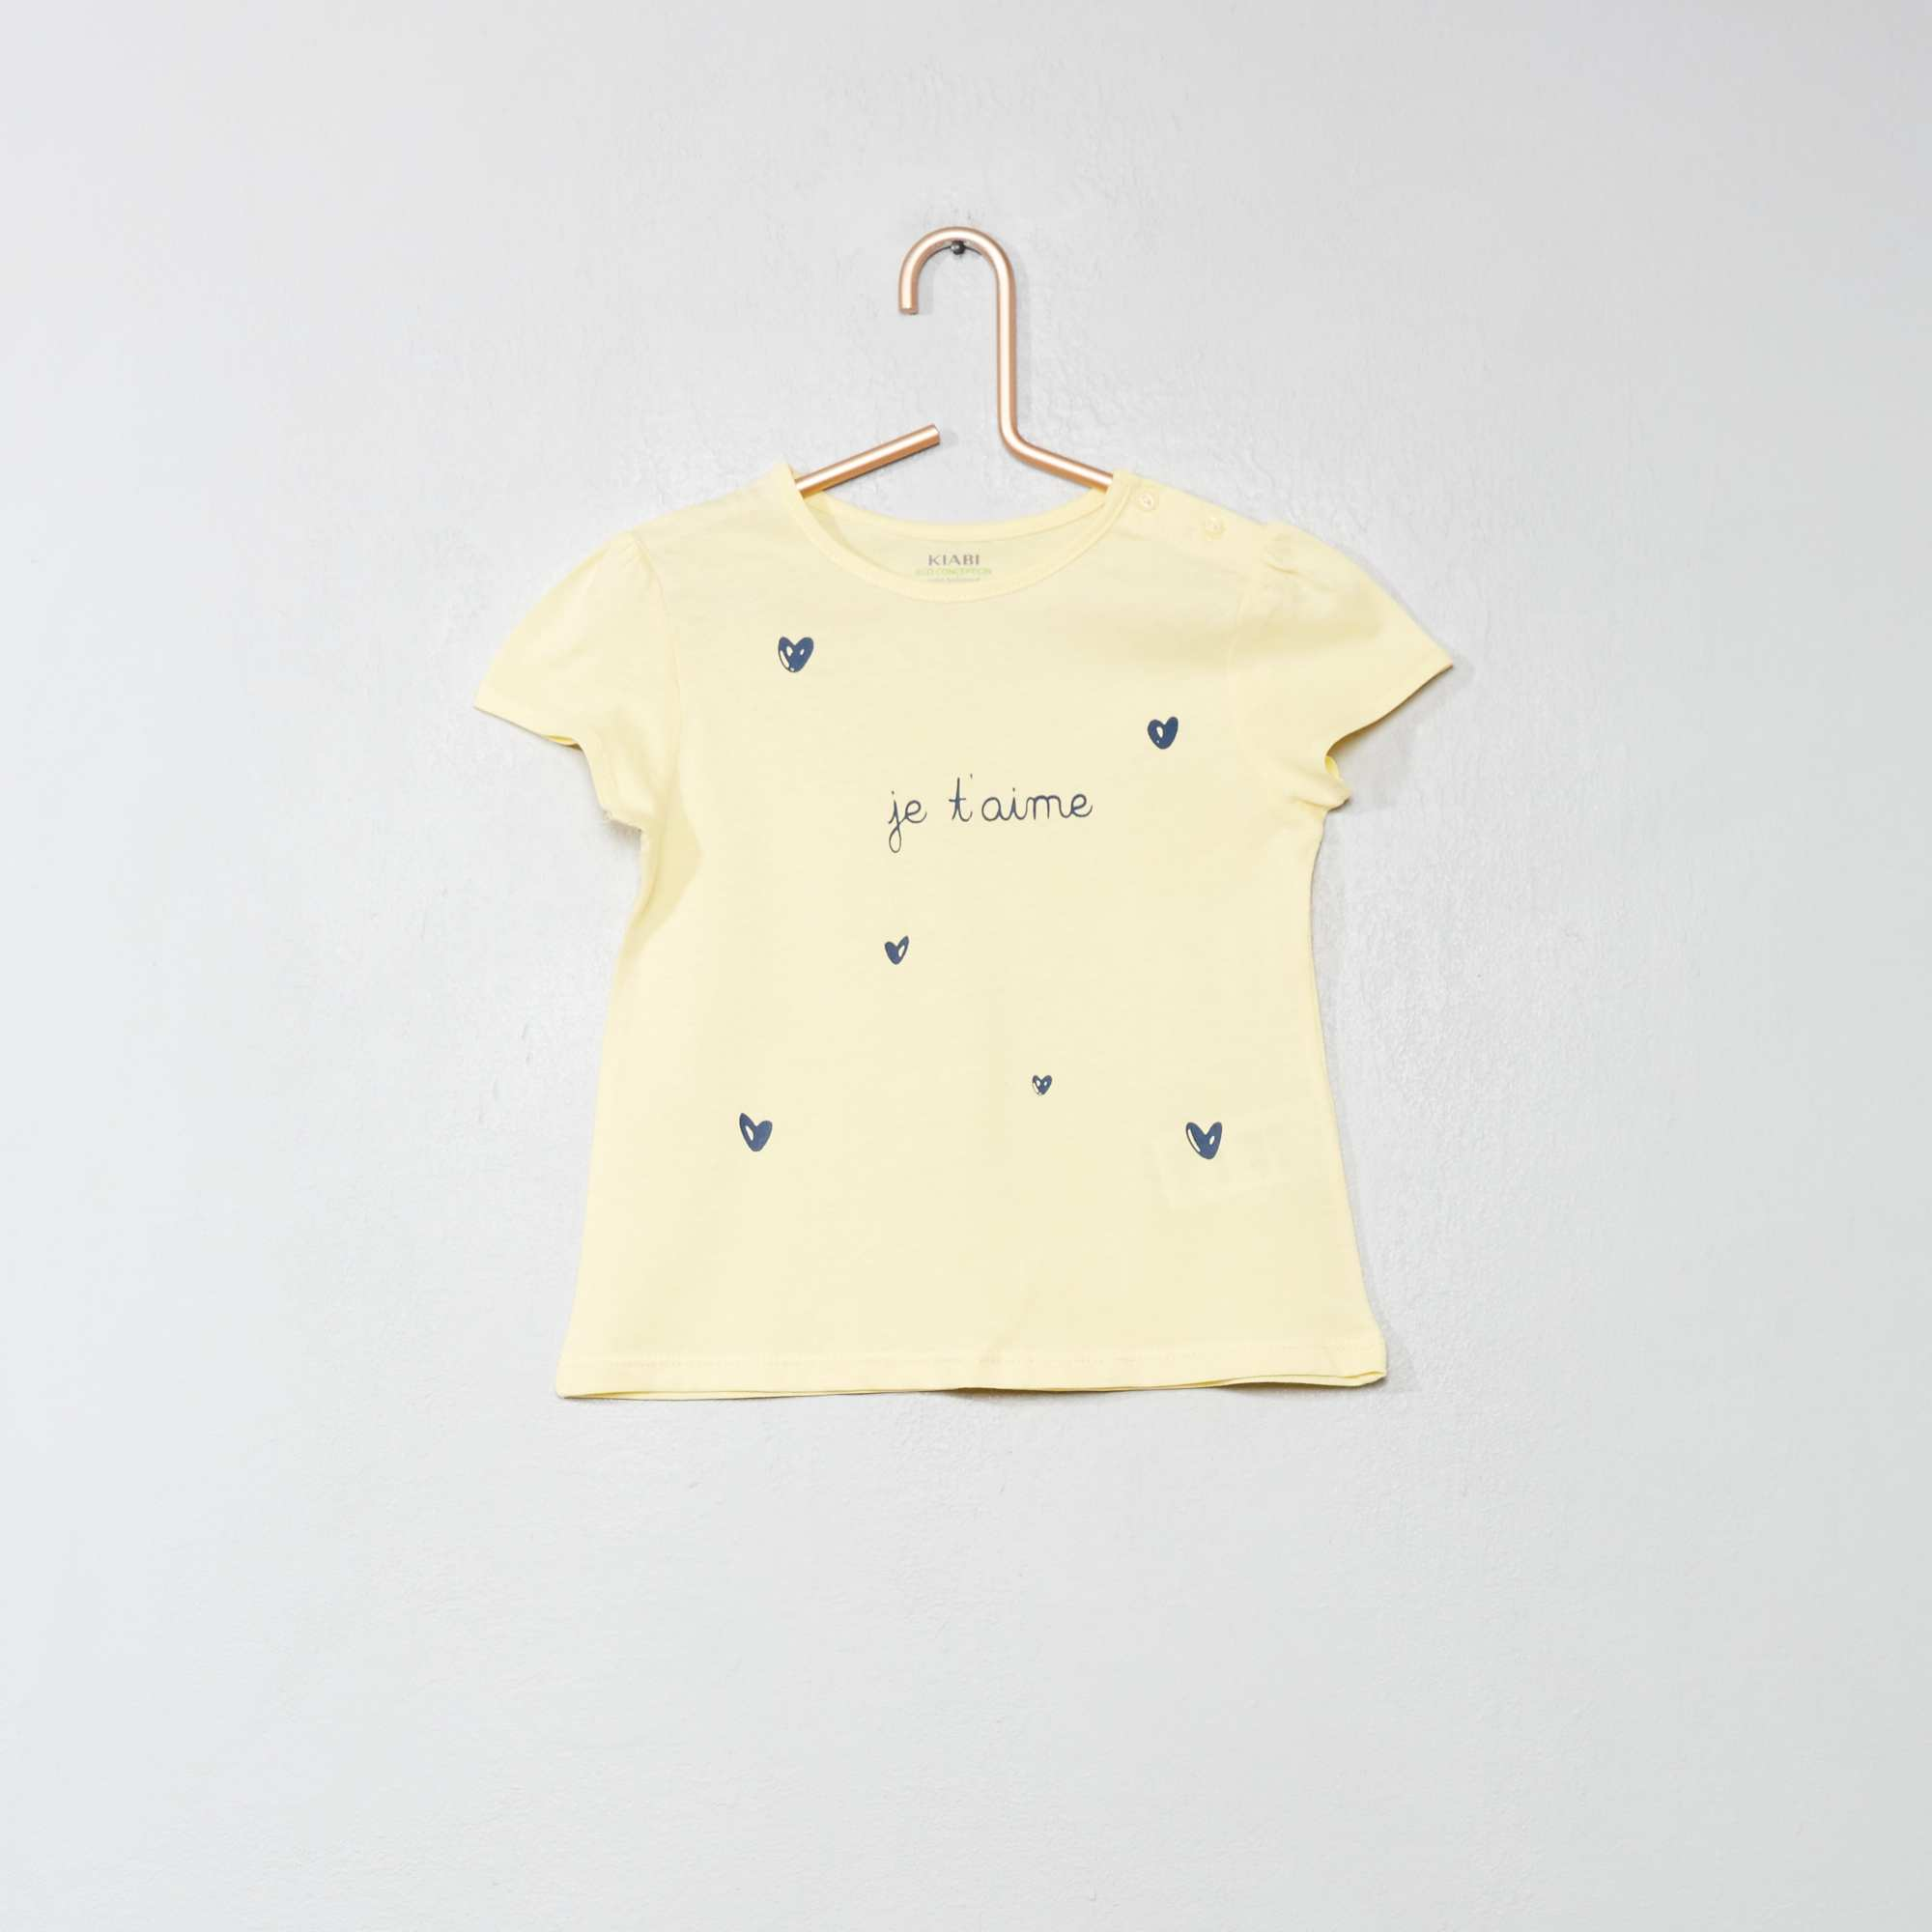 d2f737d3b Camiseta de algodón orgánico Bebé niña - AMARILLO - Kiabi - 2,00€